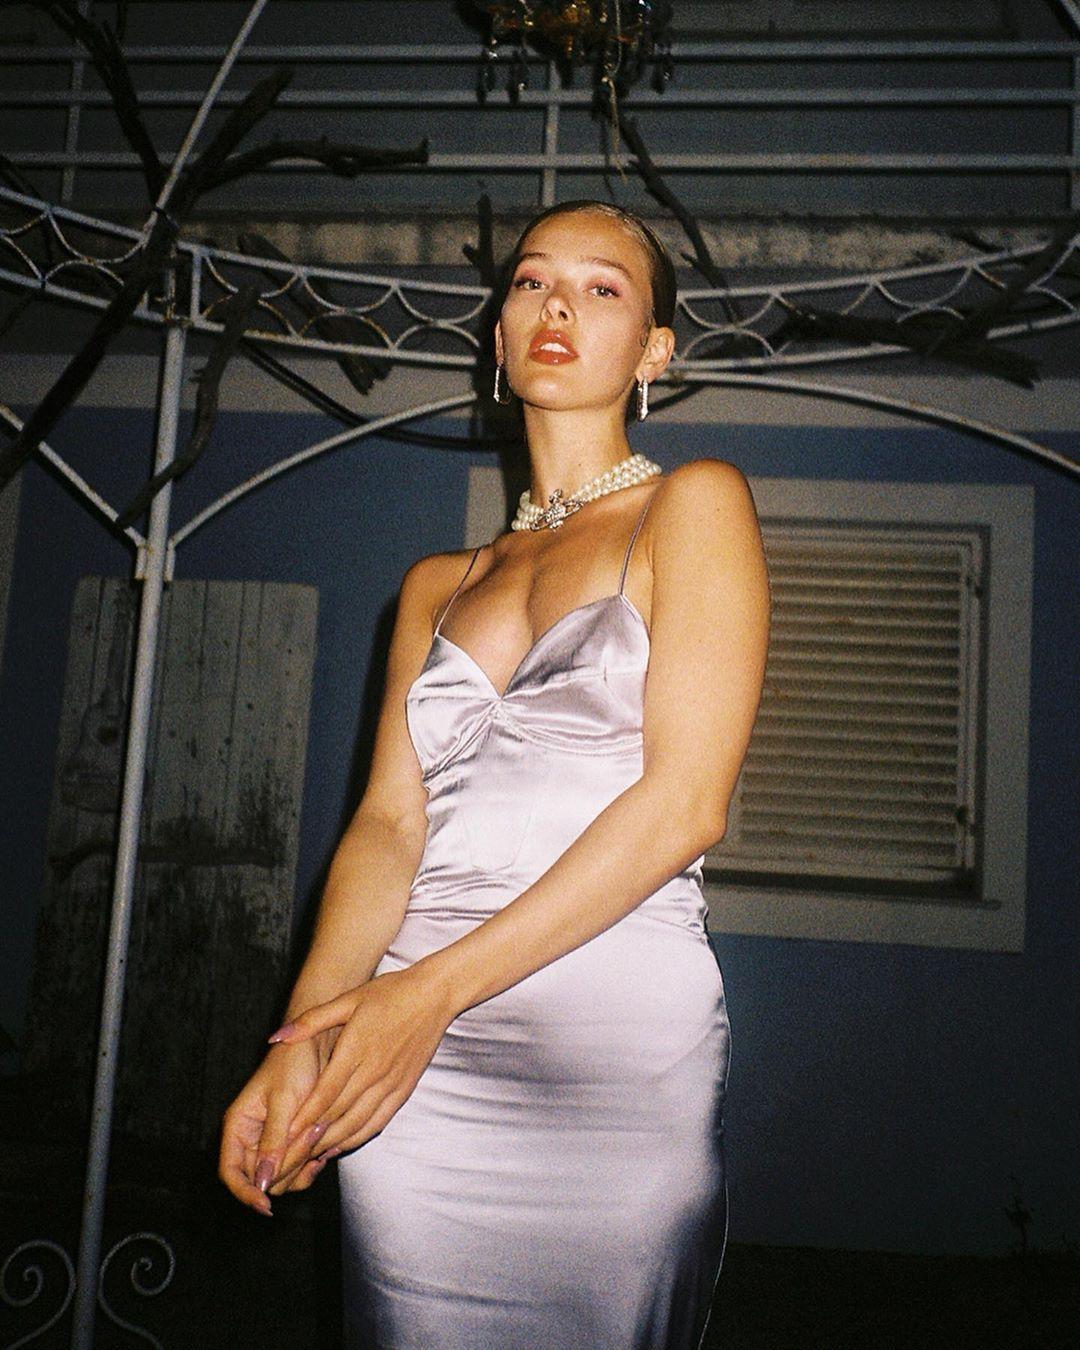 Jessica Alexander Sexy 0029